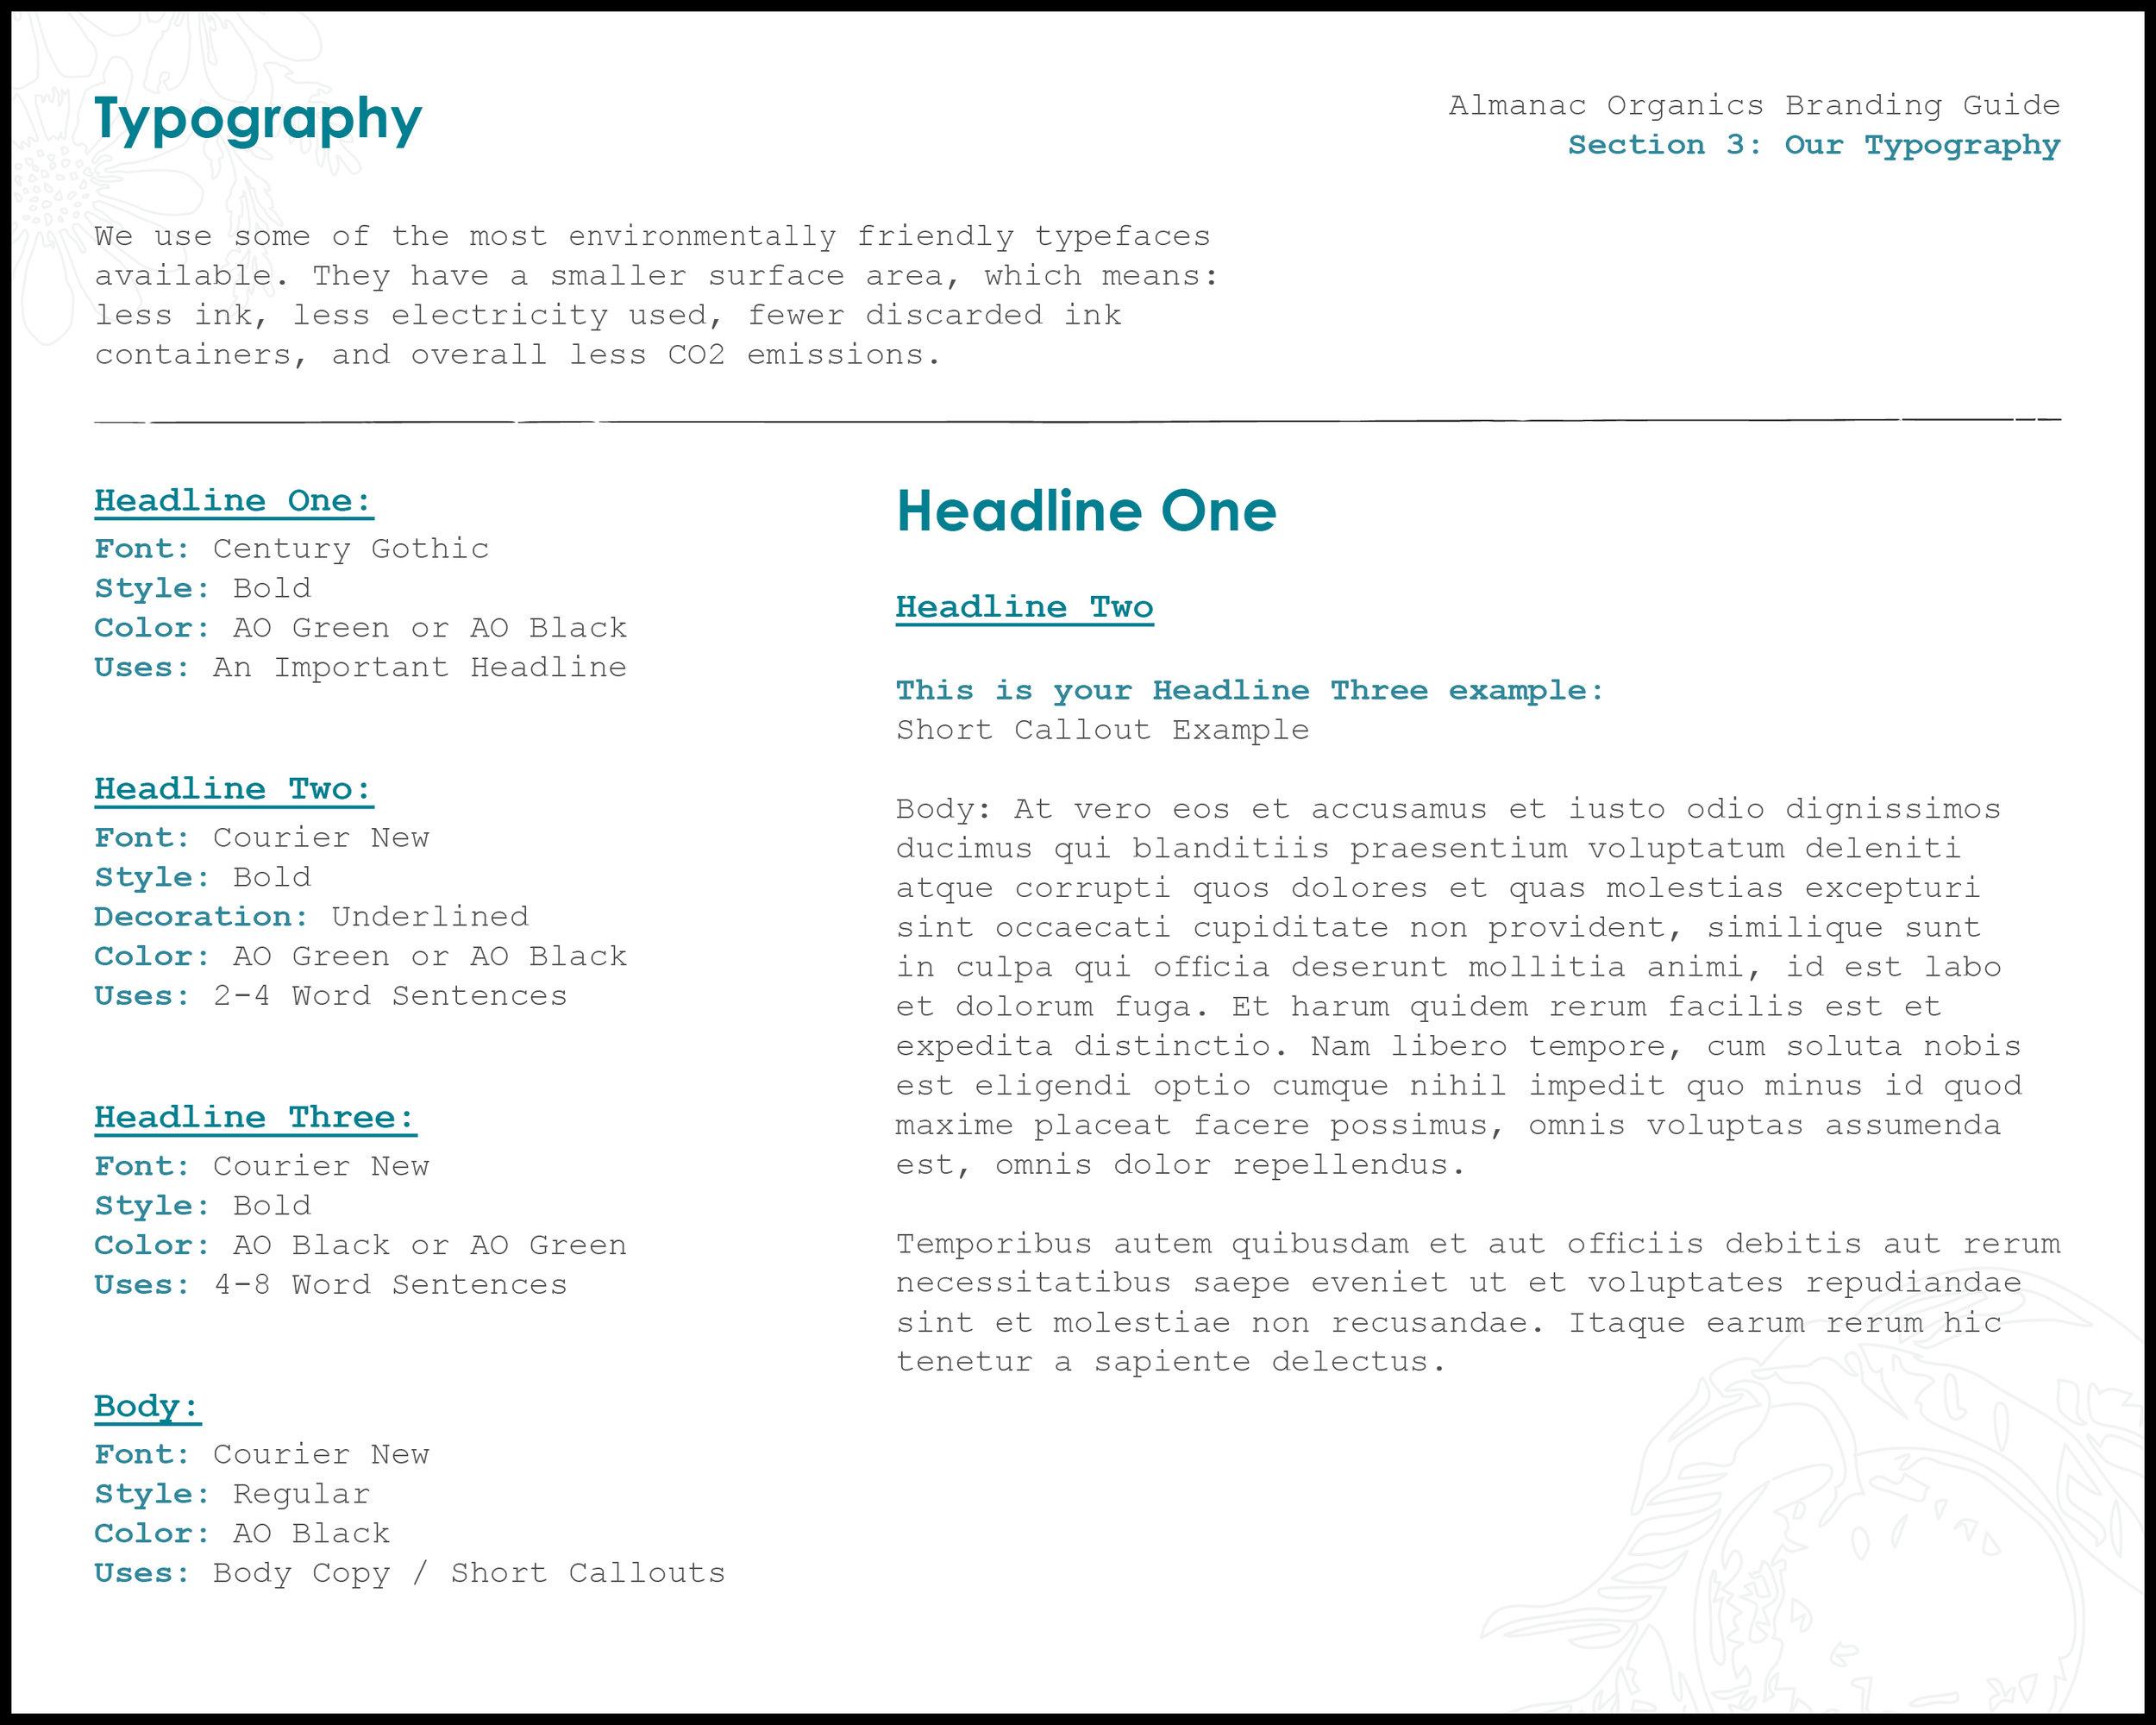 Almanac_Organics_Branding_Guide12.jpg